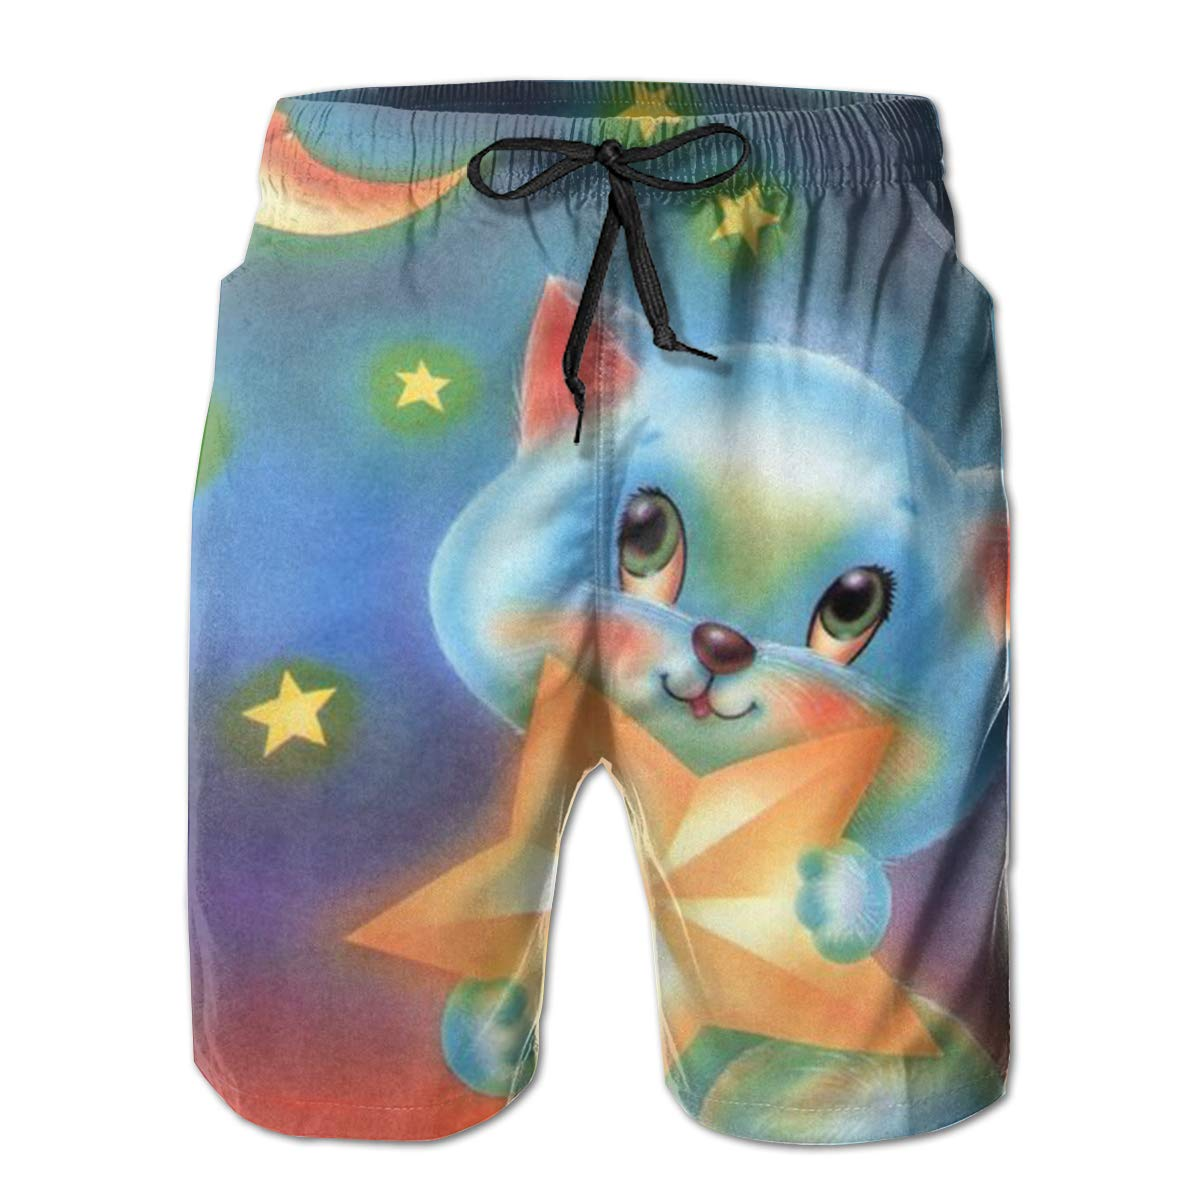 SARA NELL Mens Swim Trunks Cat in The Night Moon Stars Surfing Beach Board Shorts Swimwear